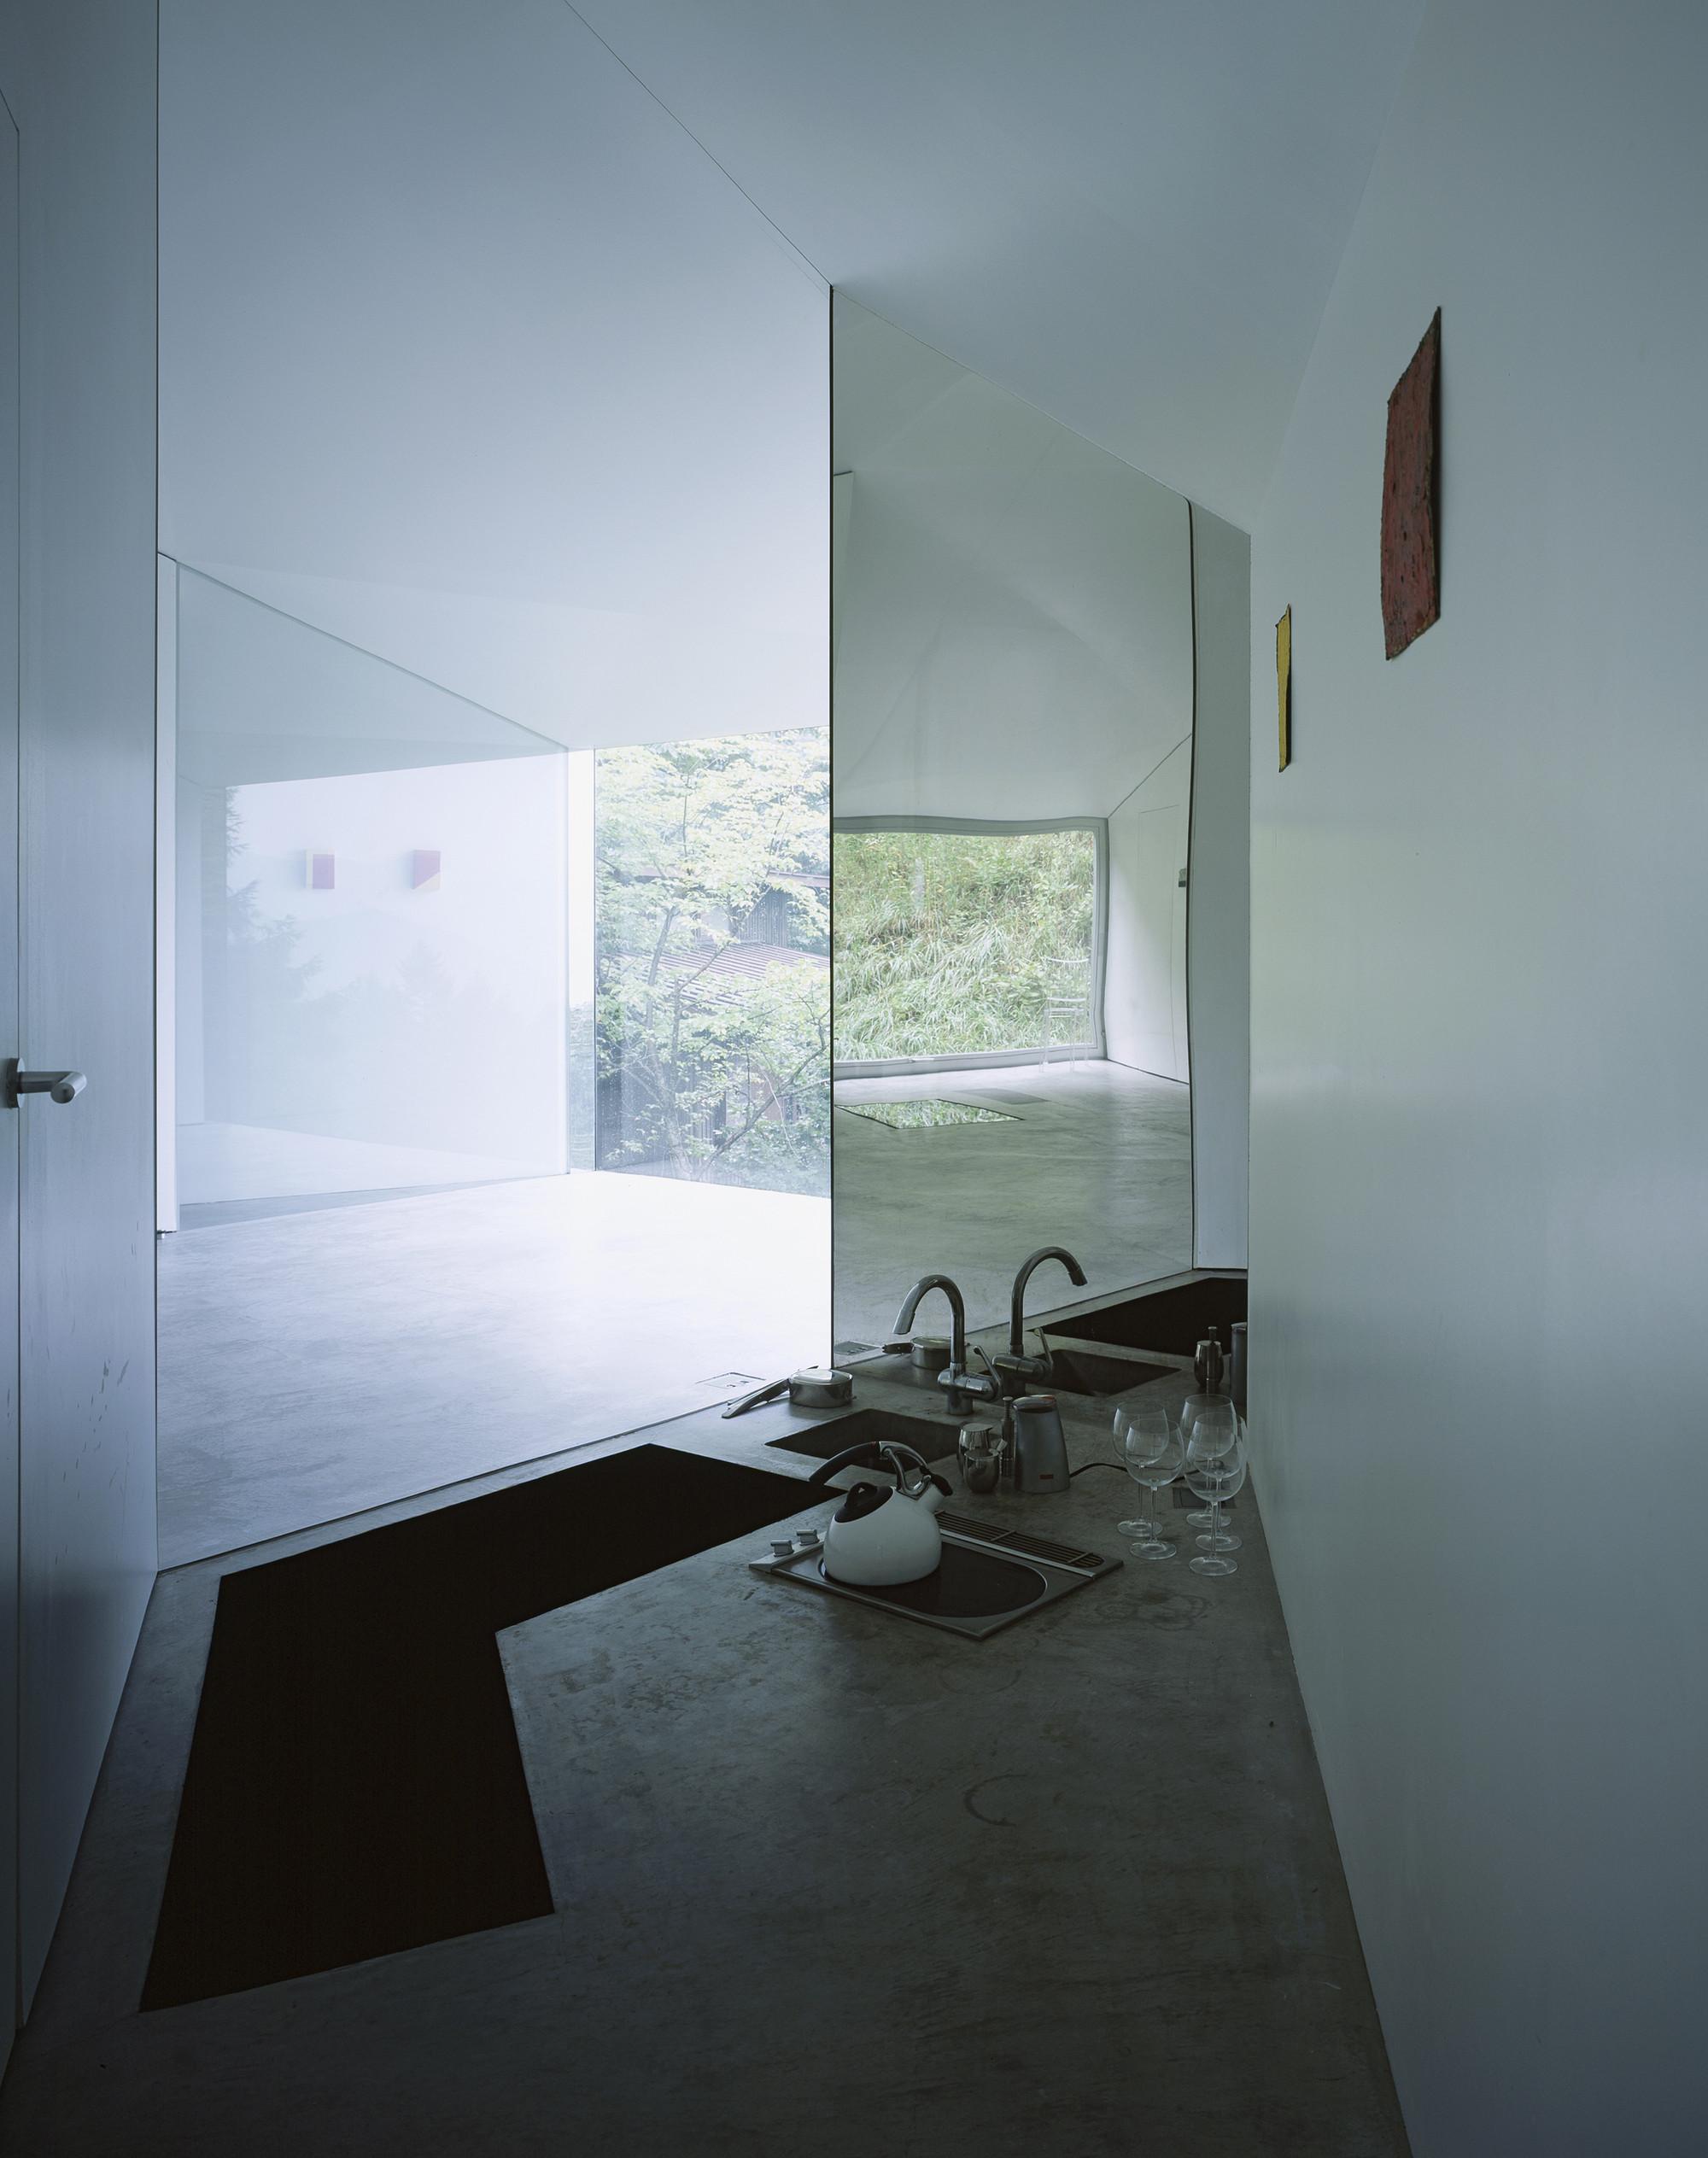 Gallery of Villa/ Gallery in Karuizawa / Makoto Yamaguchi Design - 11